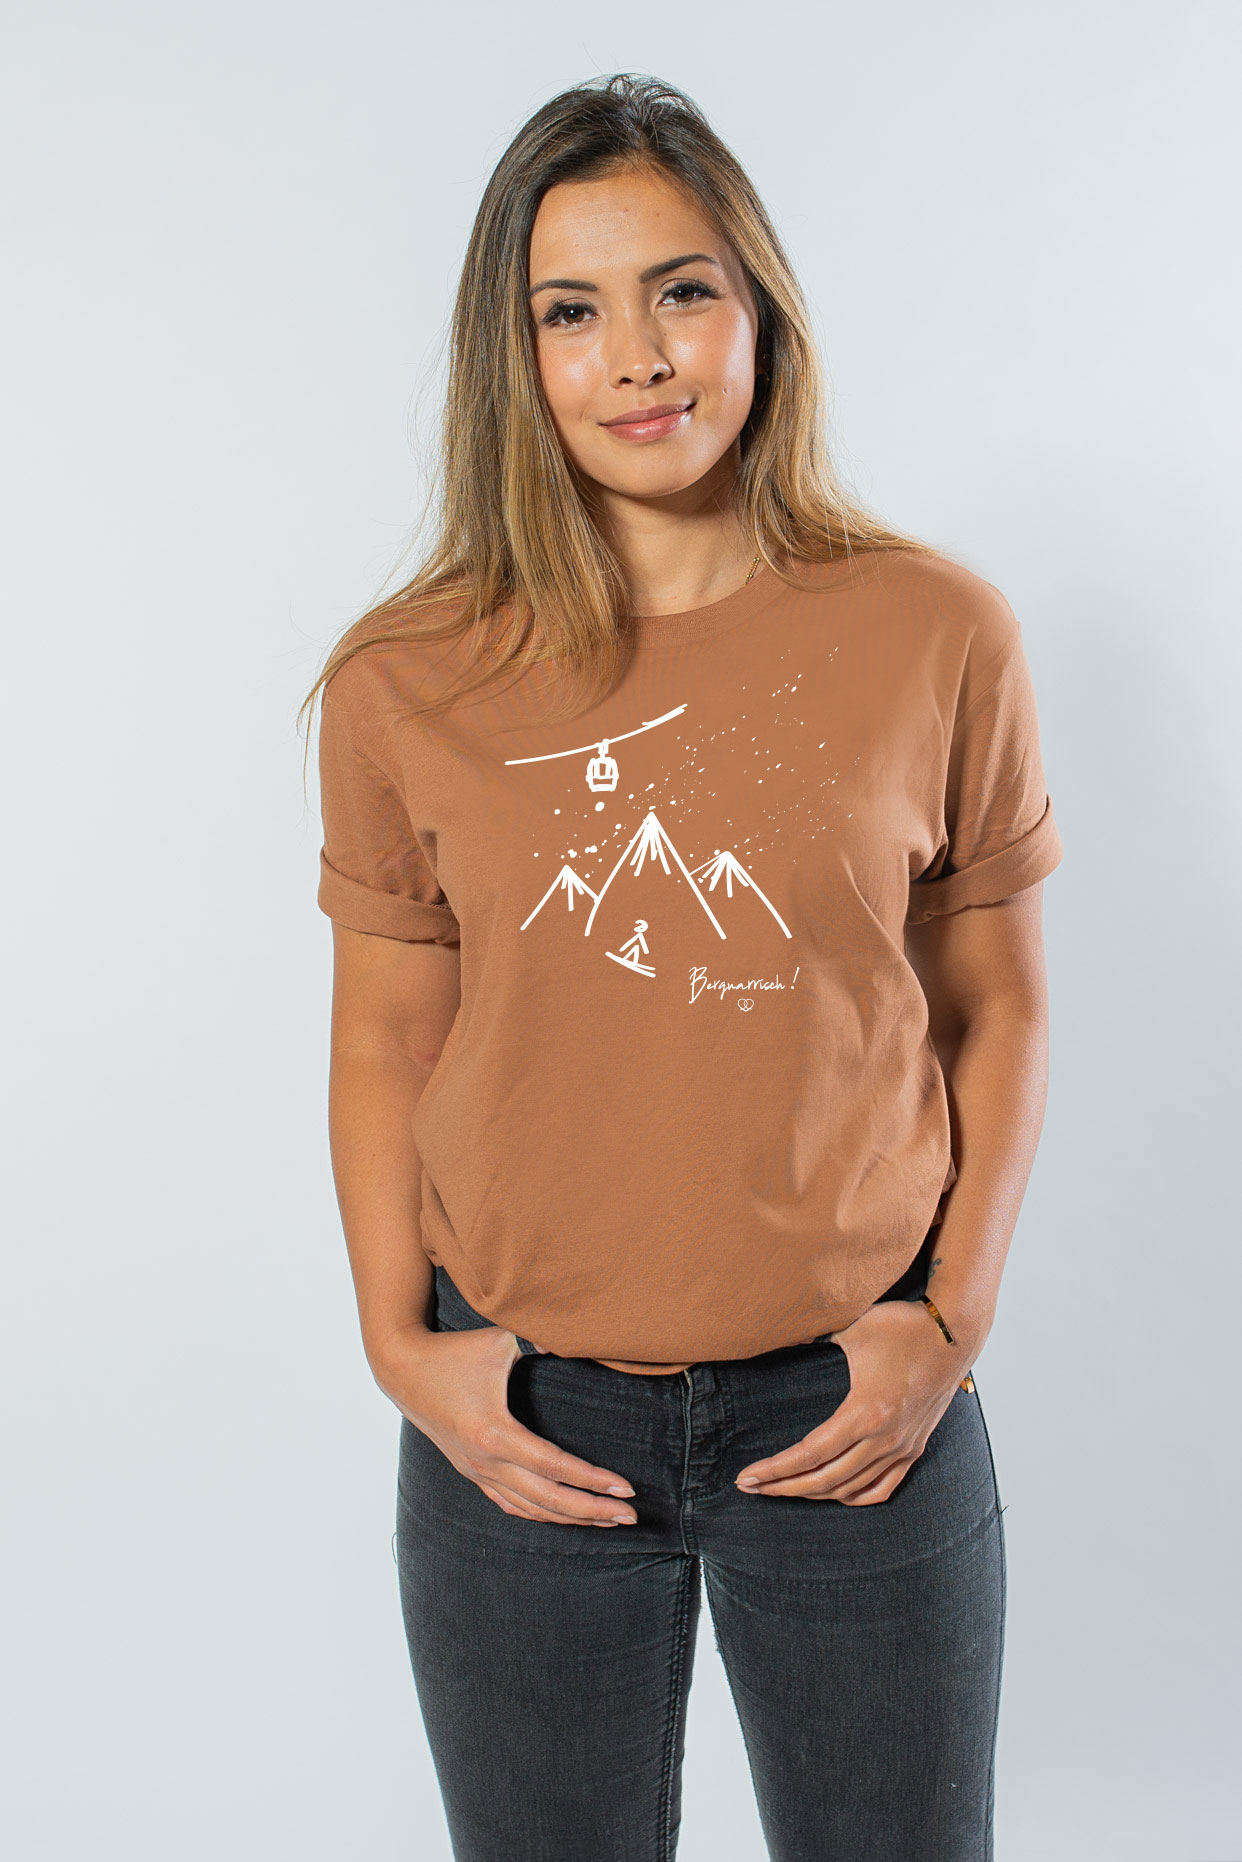 Bergnarrisch Unisex T-Shirt